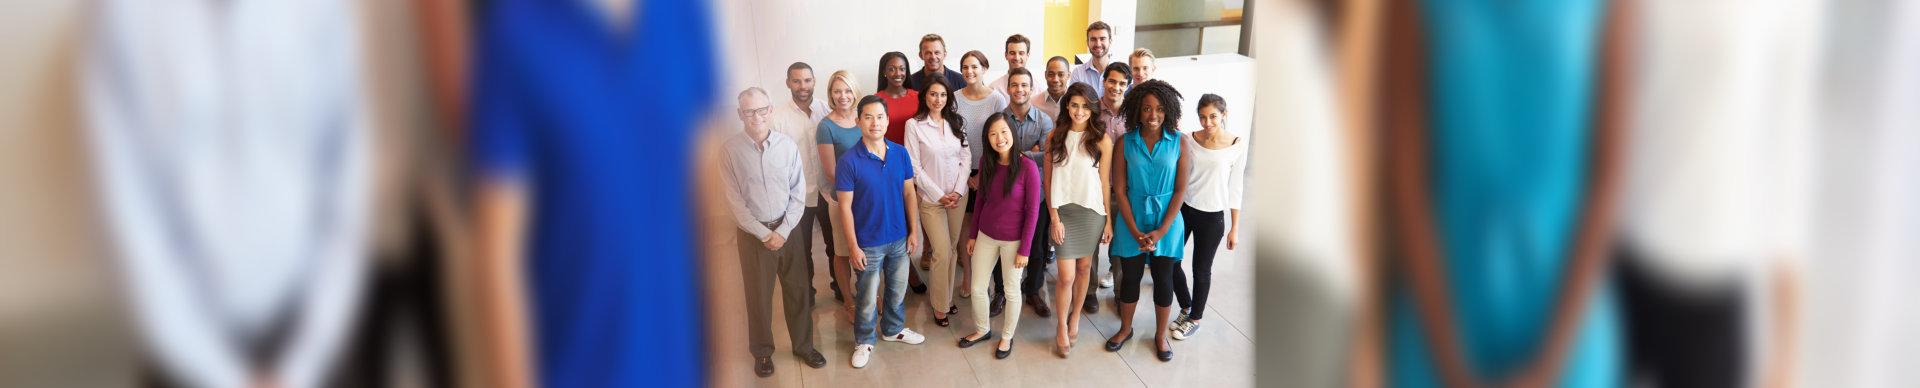 multi-cultural office staff